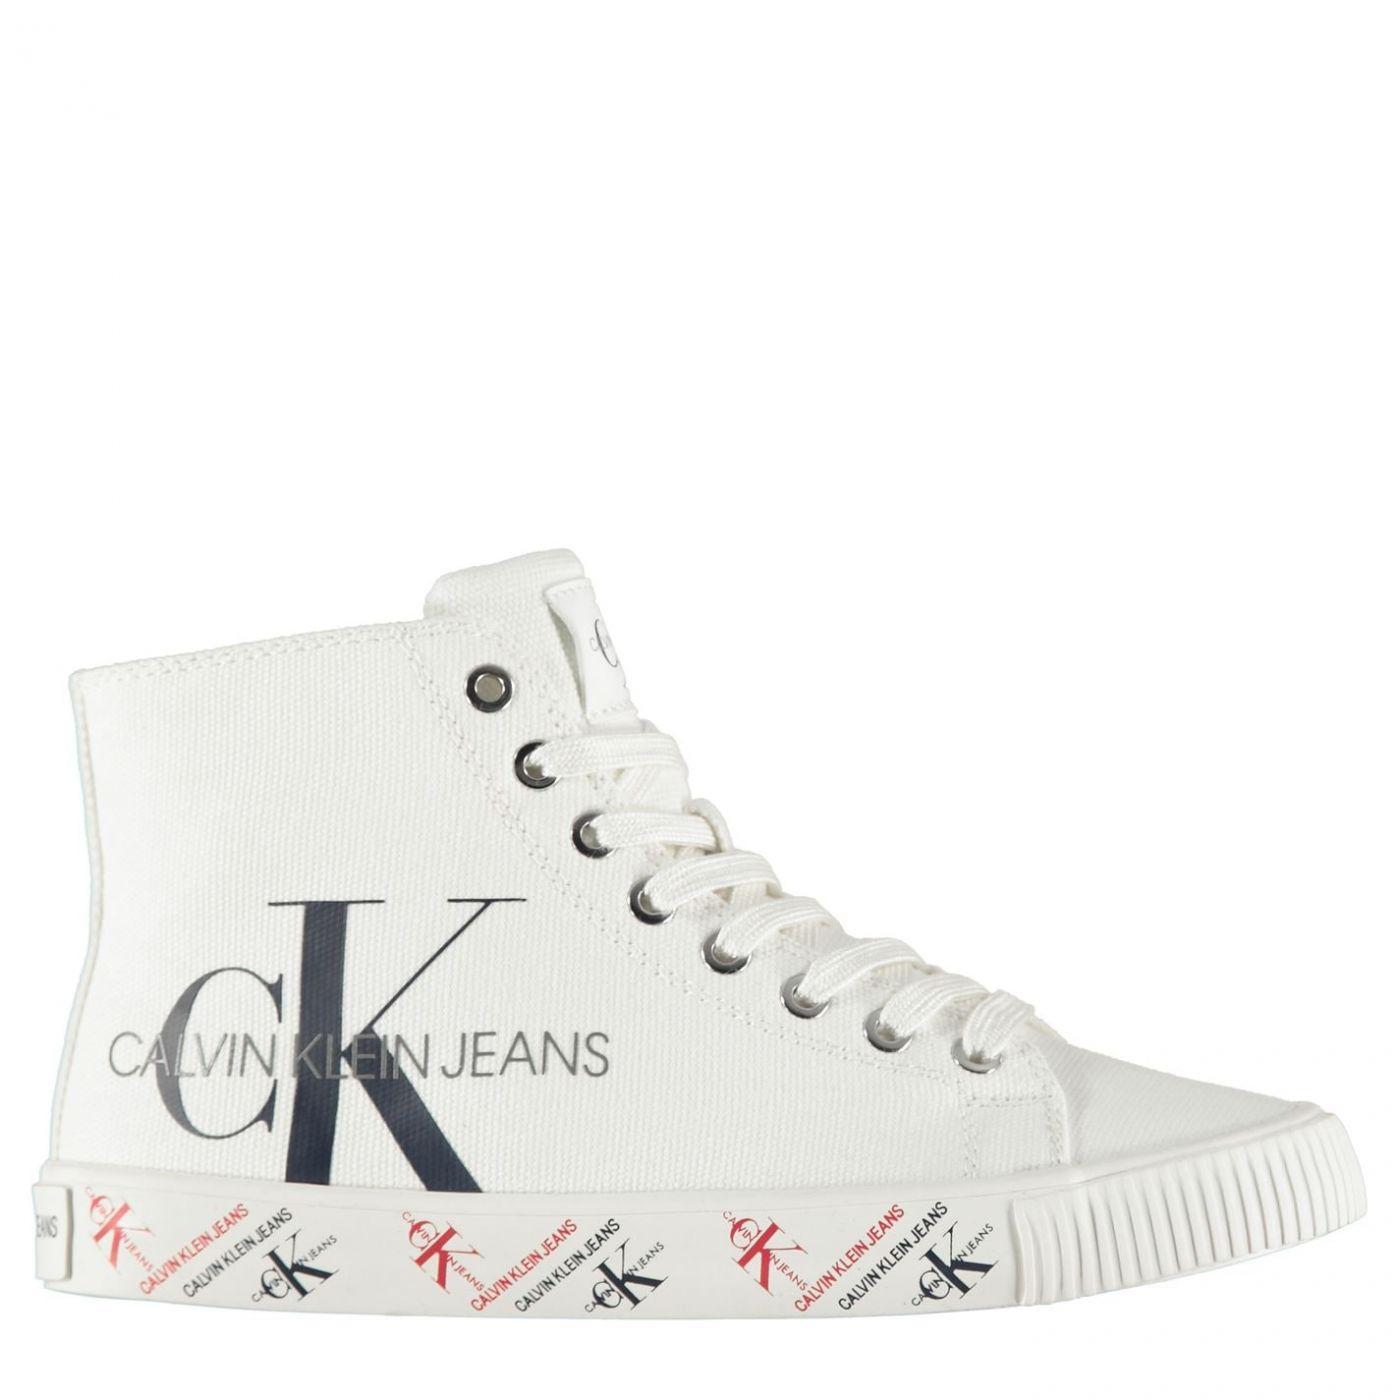 Calvin Klein Jeans Canvas High-Top Trainers